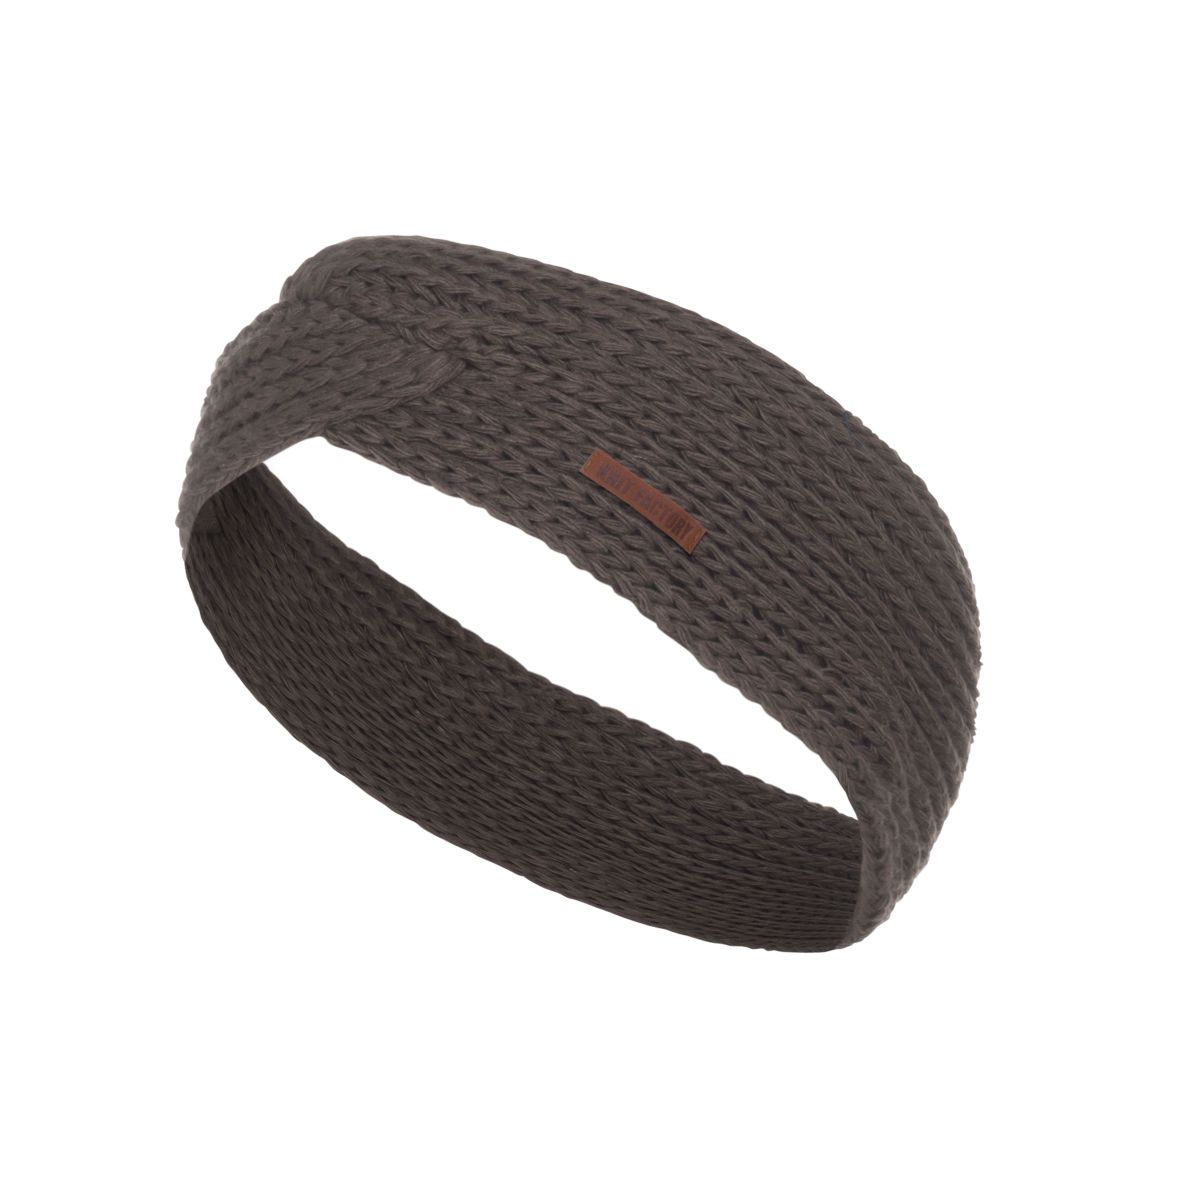 joy headband taupe